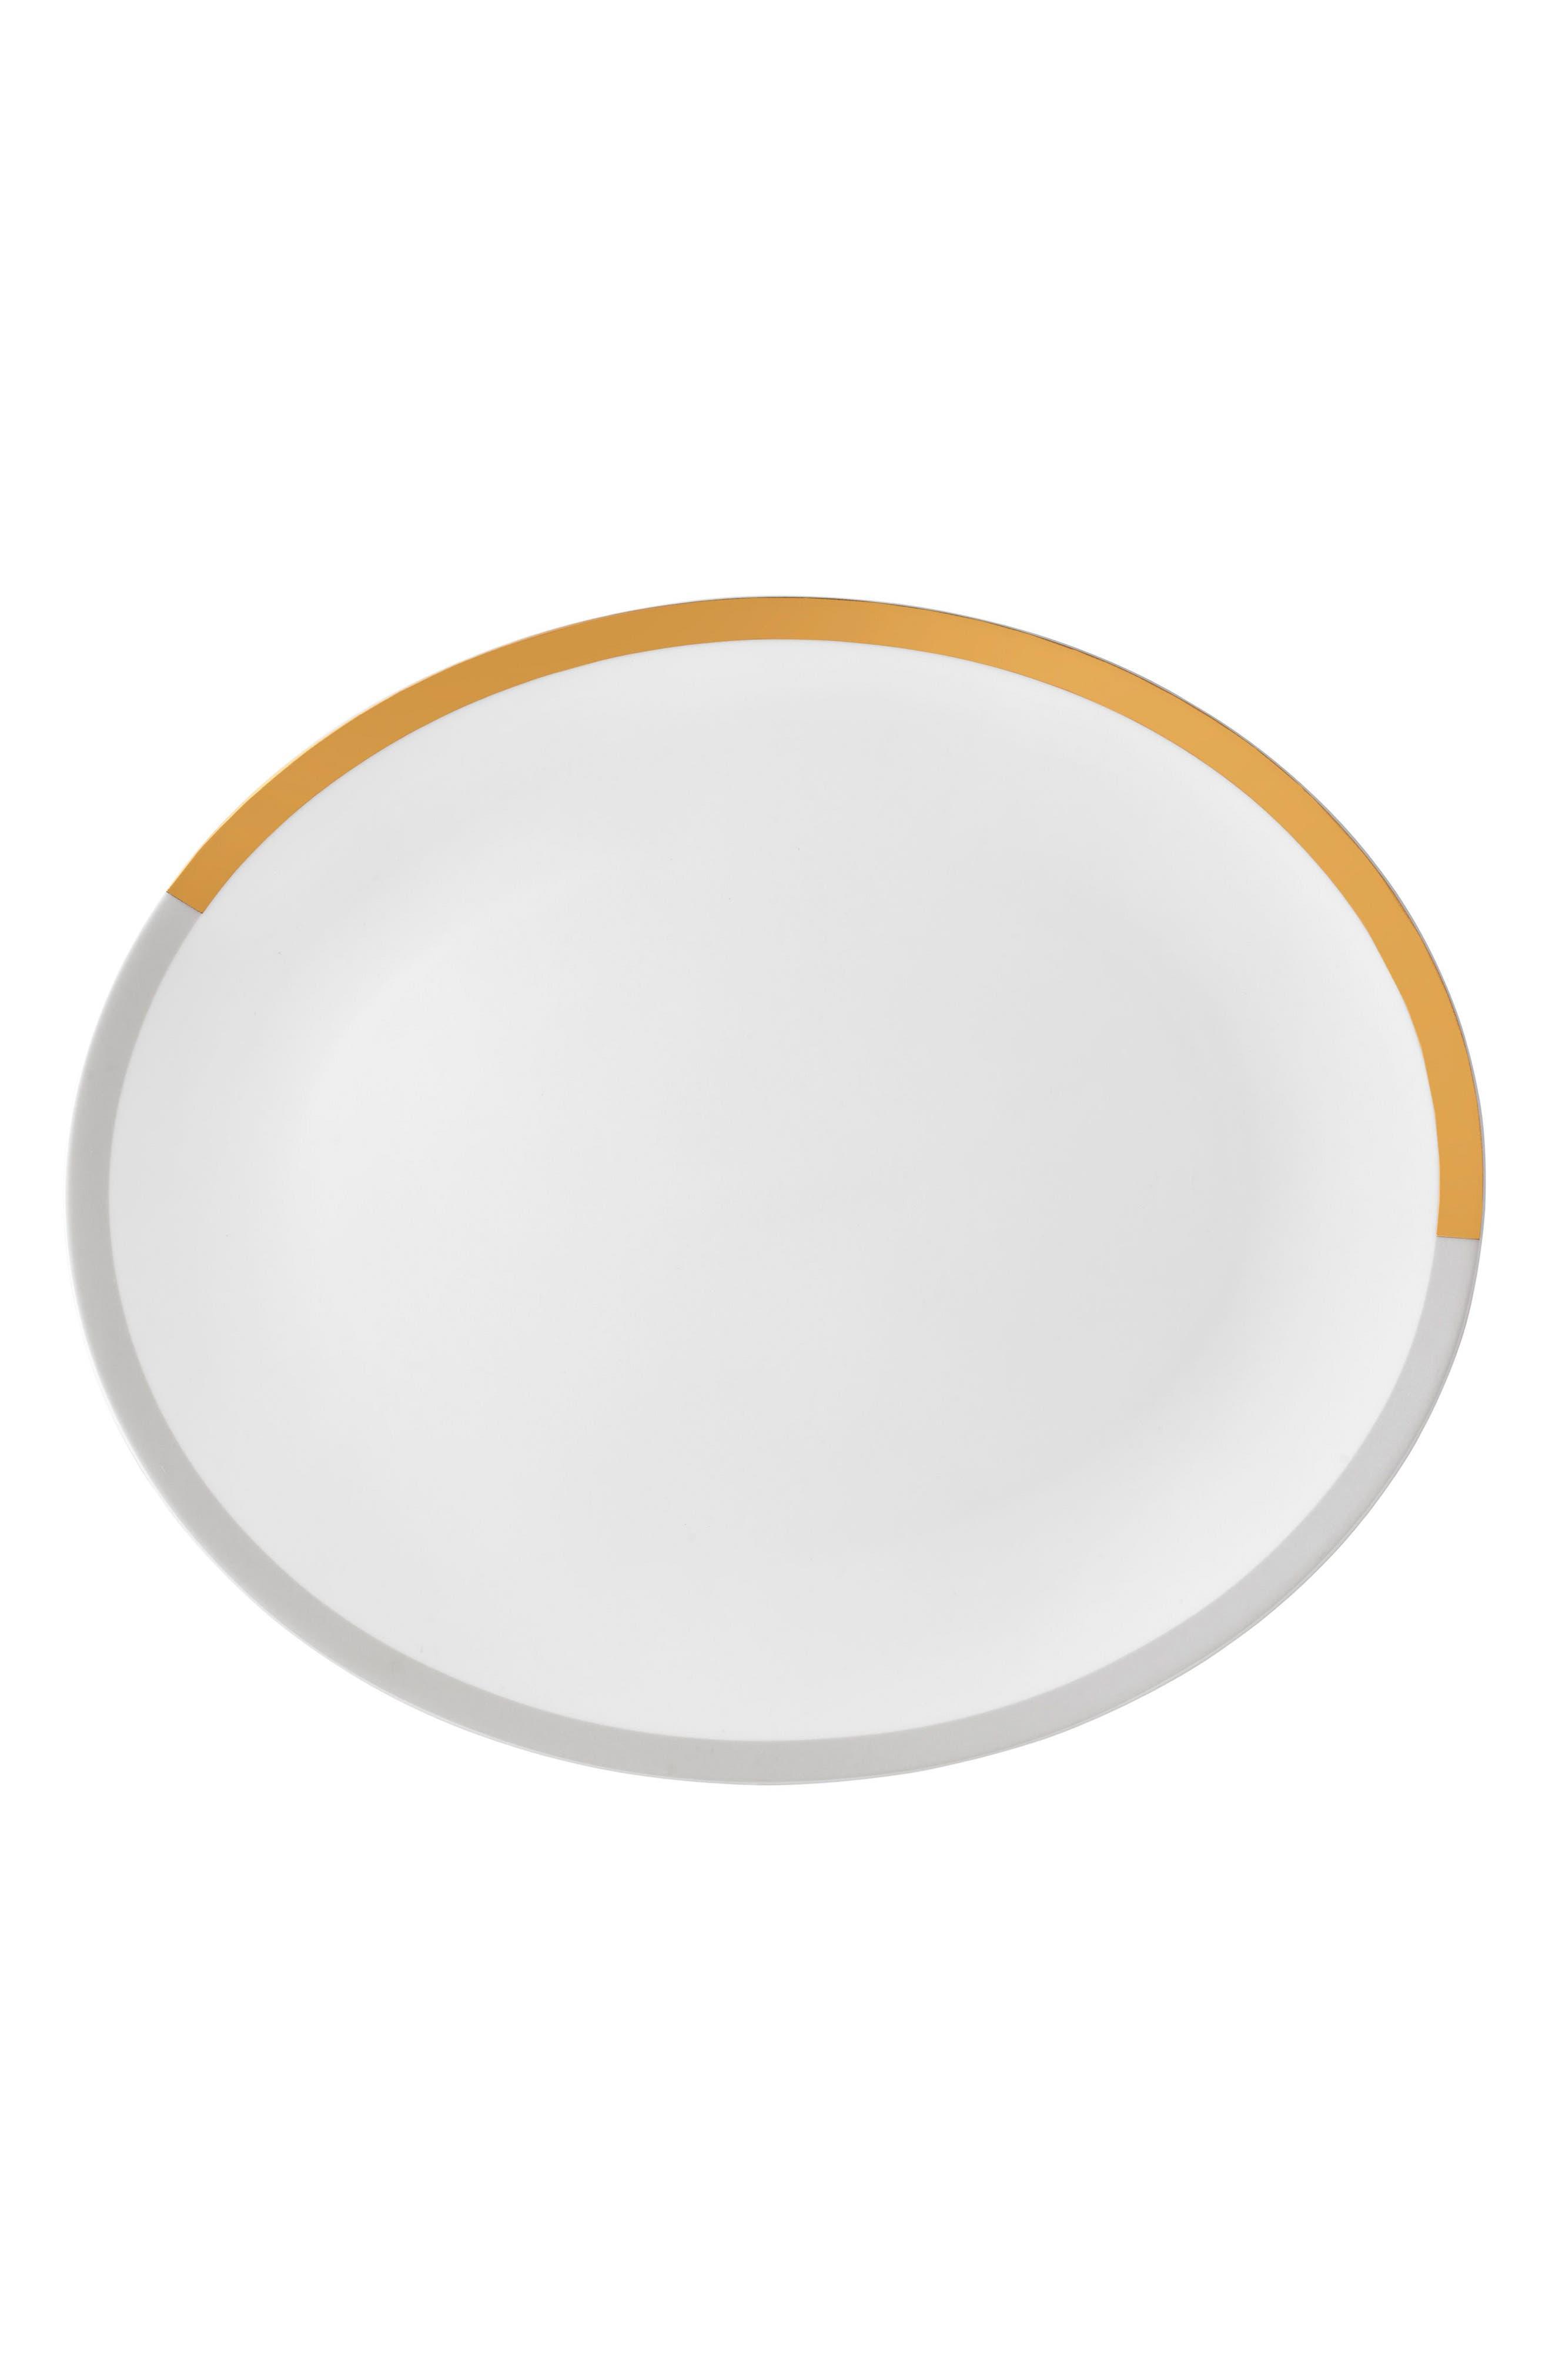 Main Image - Vera Wang x Wedgwood Vera Castillon Bone China Oval Platter